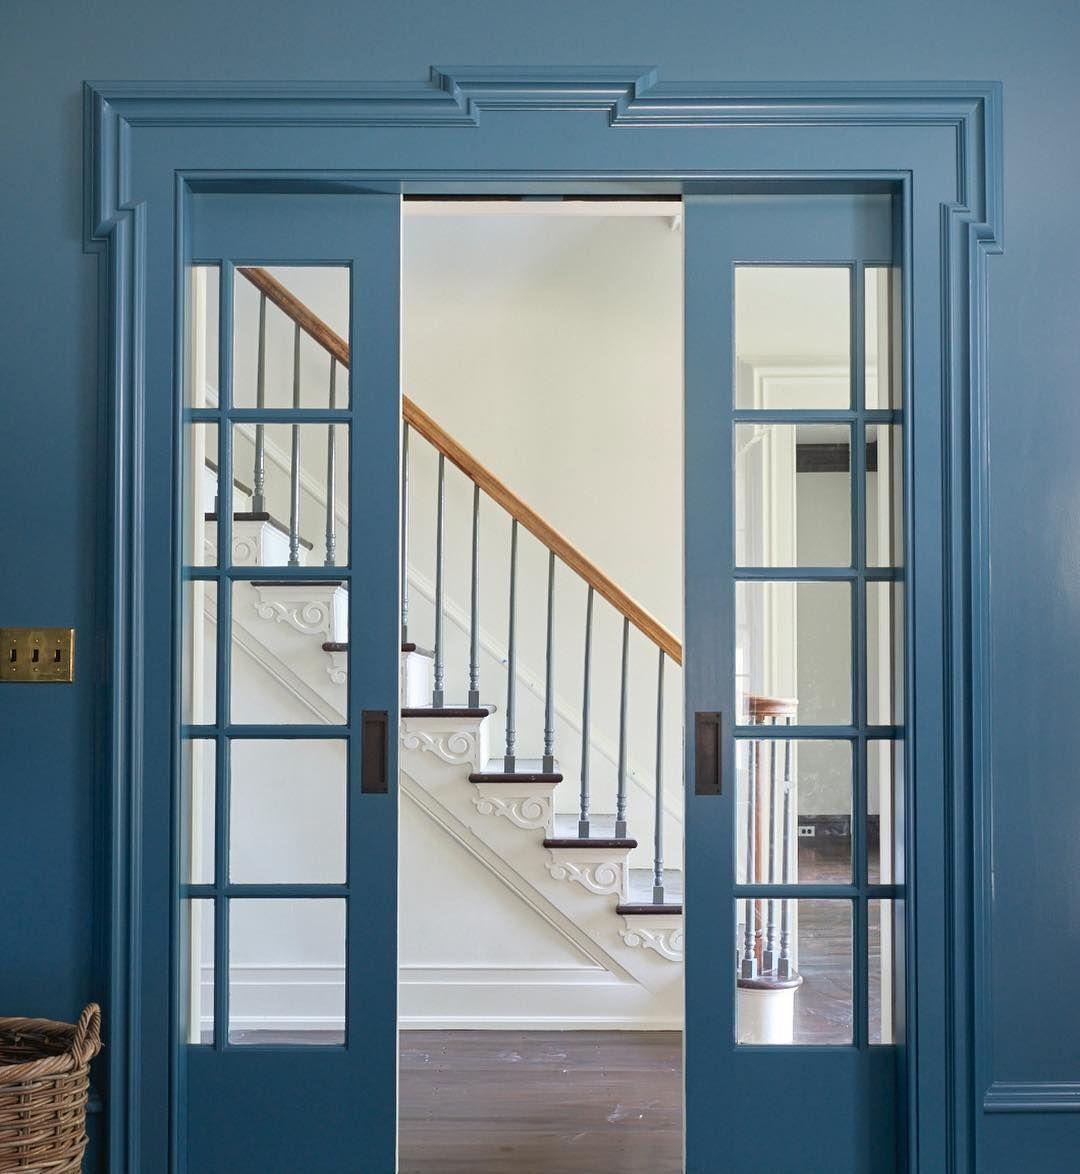 Benjamin Moore Bella Blue Painted Walls Interior Paint Color Scheme